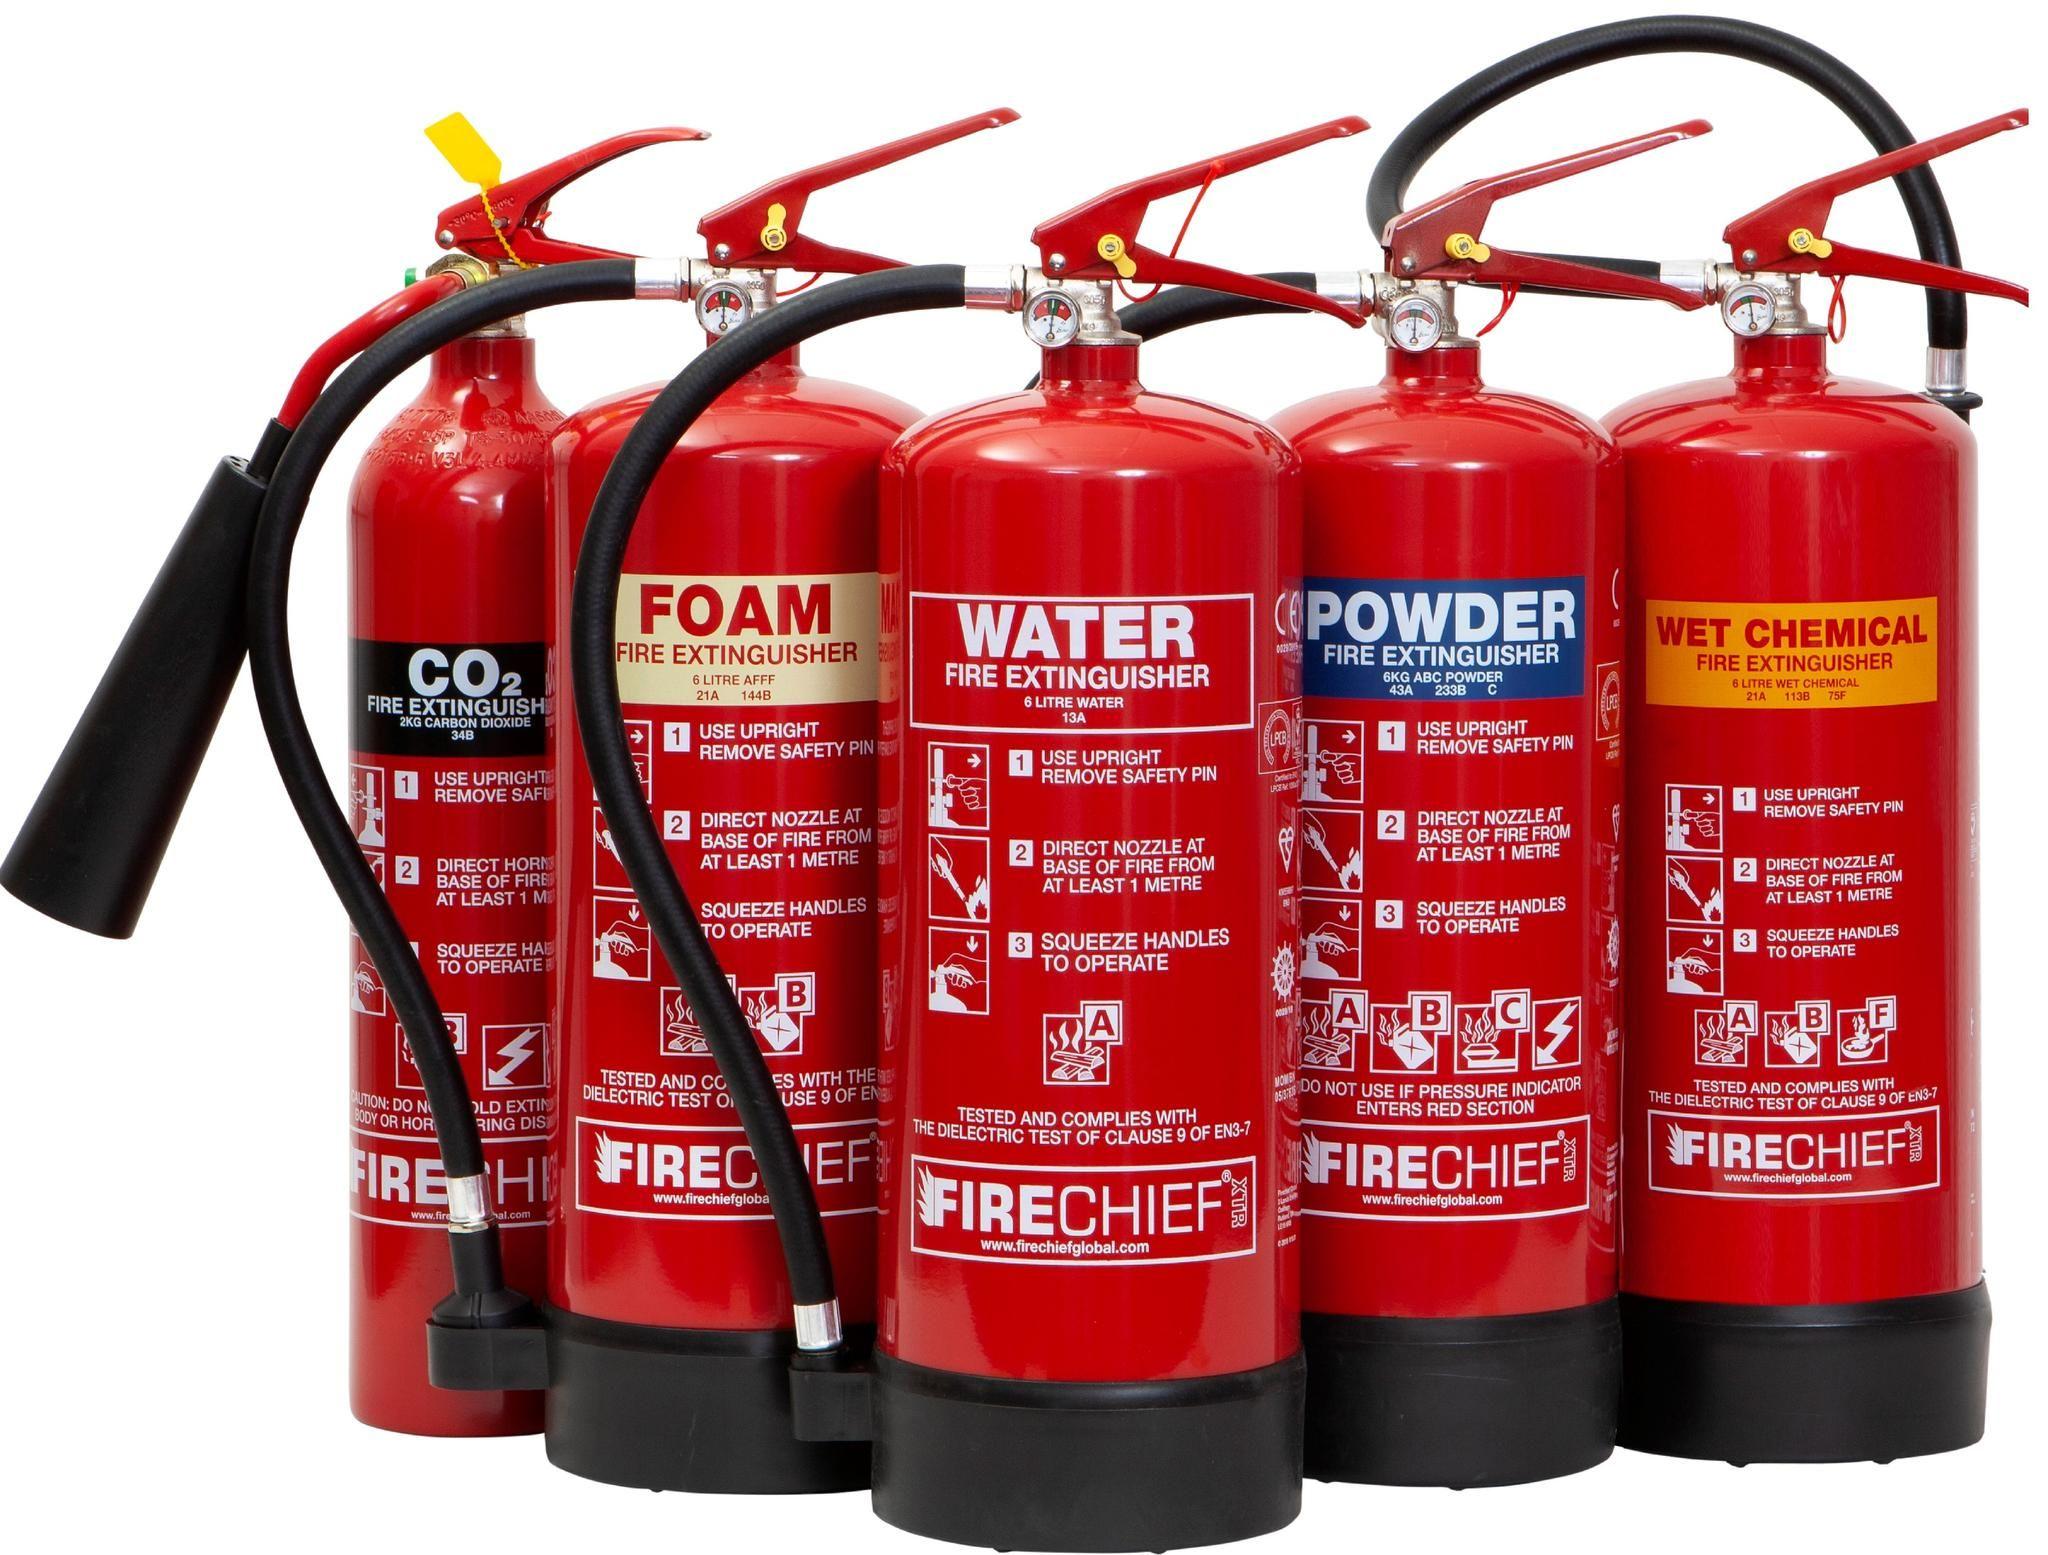 The Firechief XTR Fire Extinguisher Range